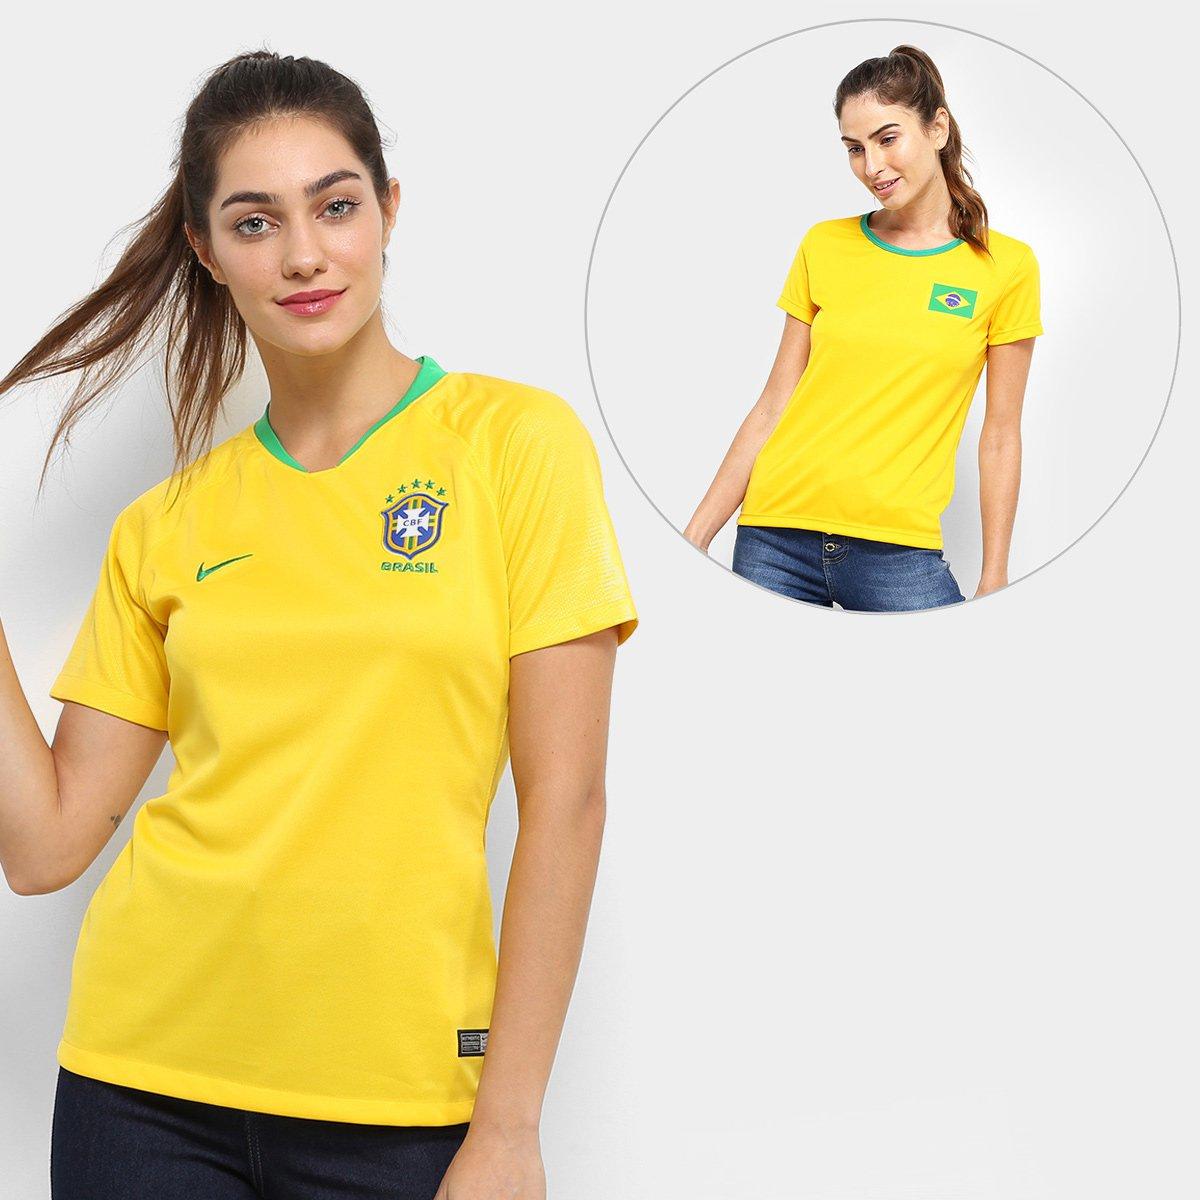 8372d053f Kit Feminino Torcida Brasil - Camisa Nike Seleção Brasil I 2018 s nº + Camisa  Torcedor - Compre Agora